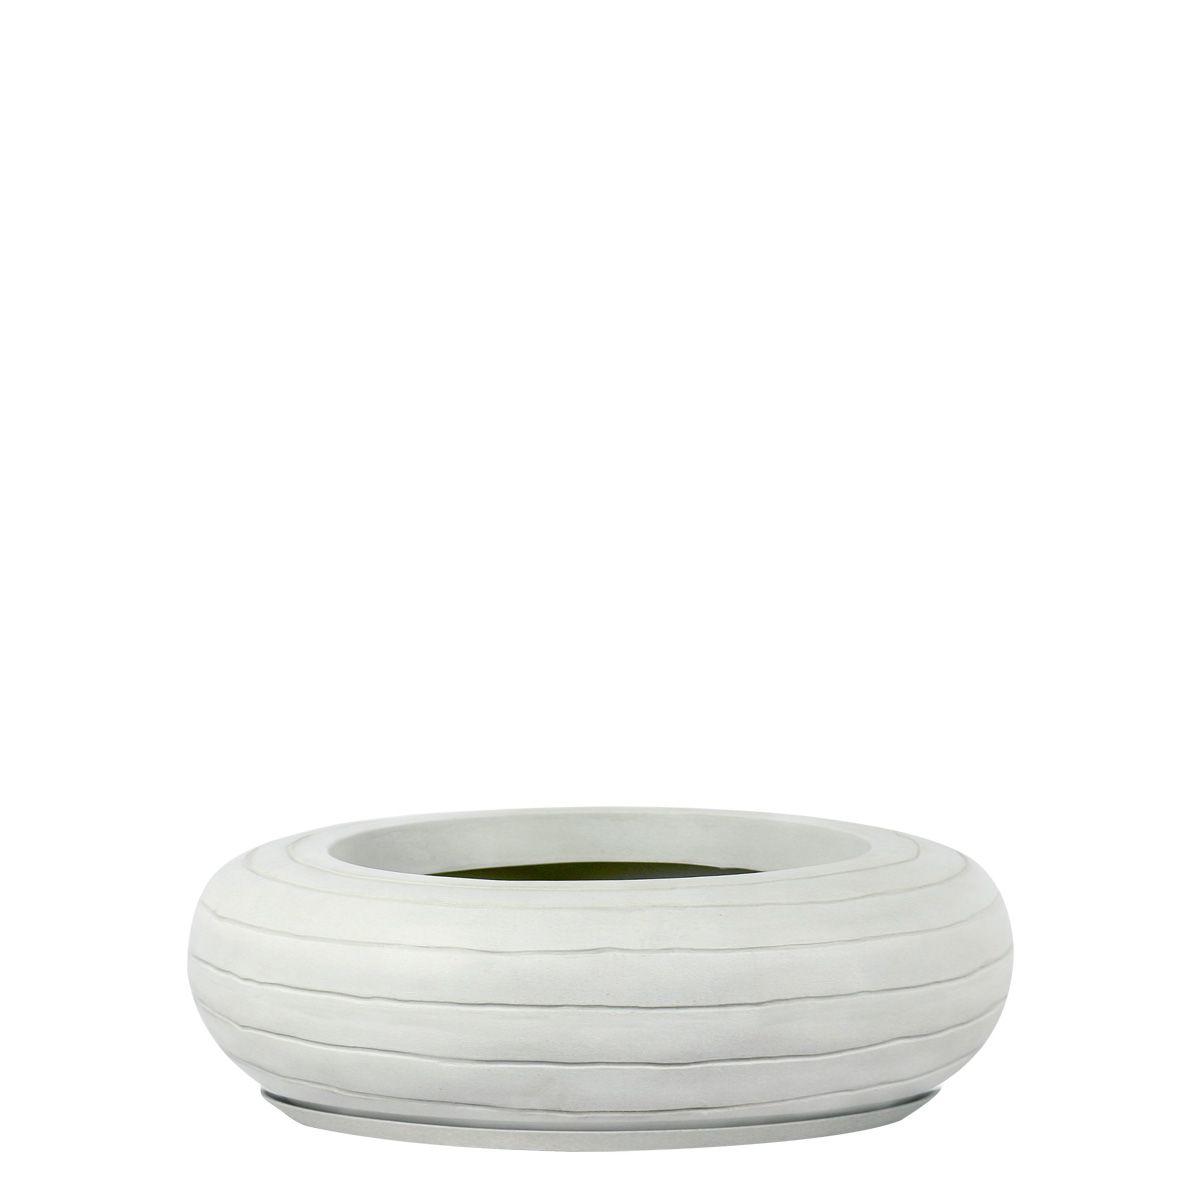 Vaso Relevo Bowl 35 x 16 cm - VASART